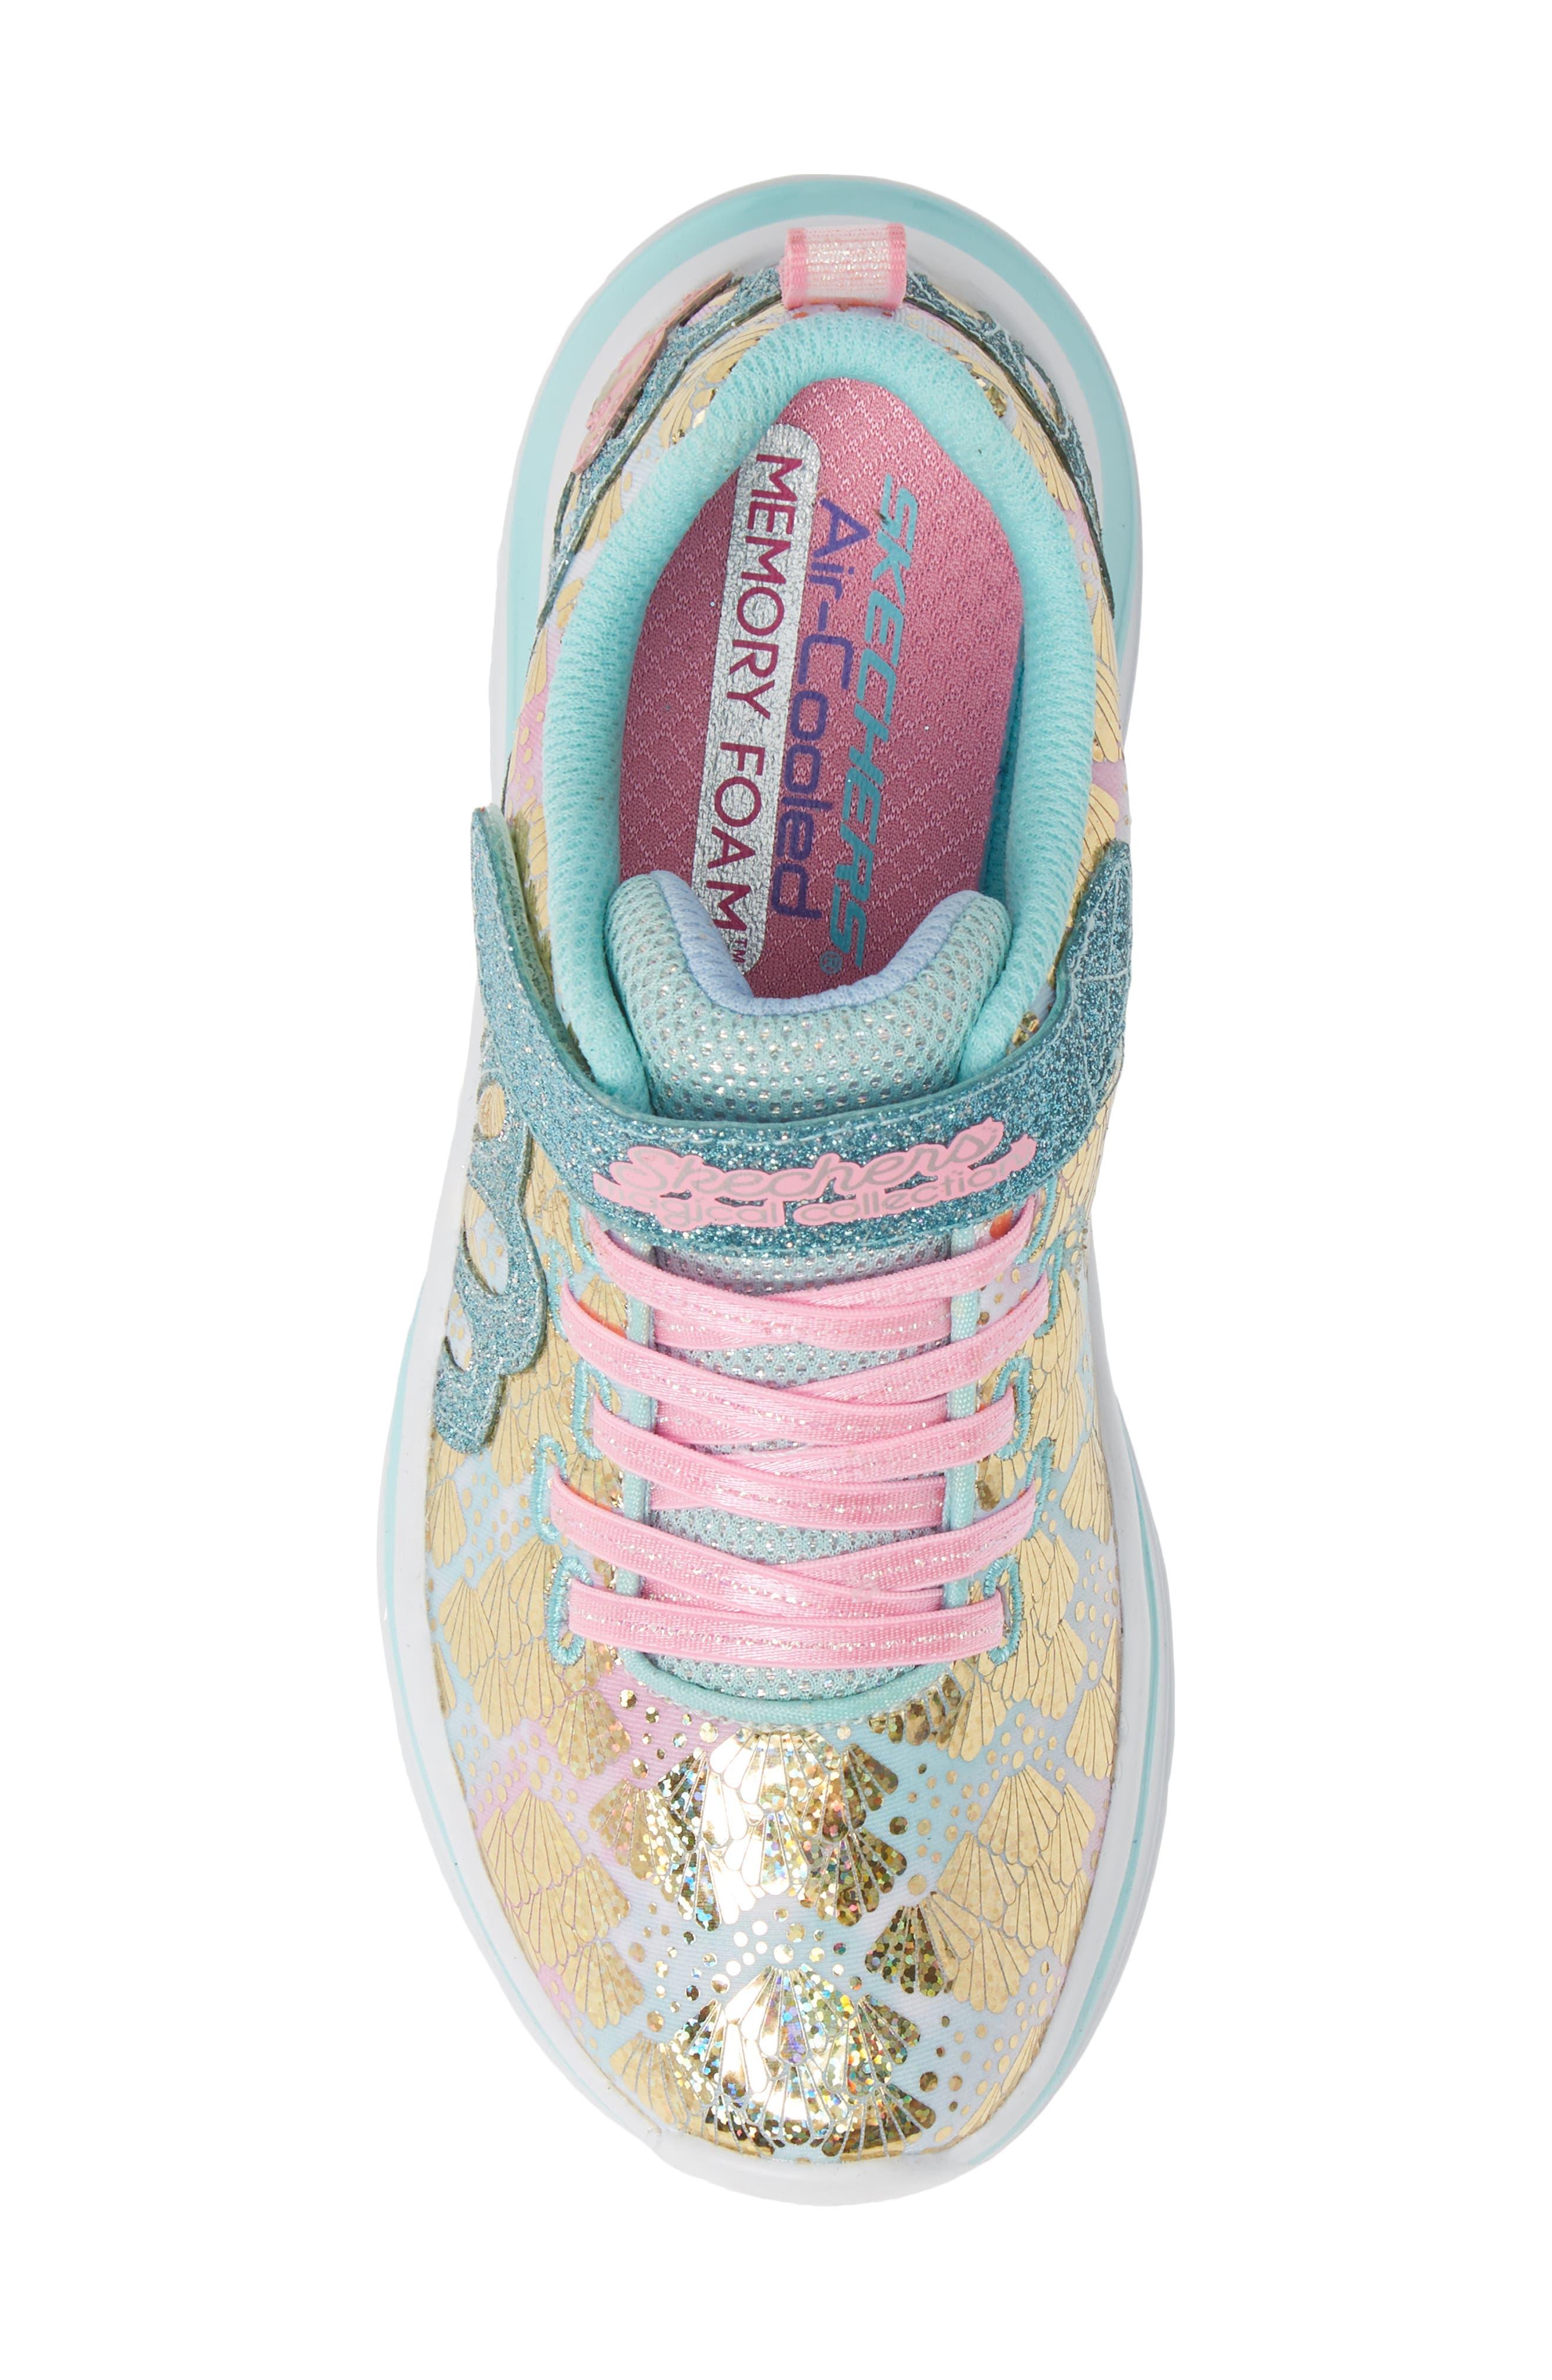 Double Dreams Shimmer Sneaker,                             Alternate thumbnail 5, color,                             AQUA/ PINK TEXTILE